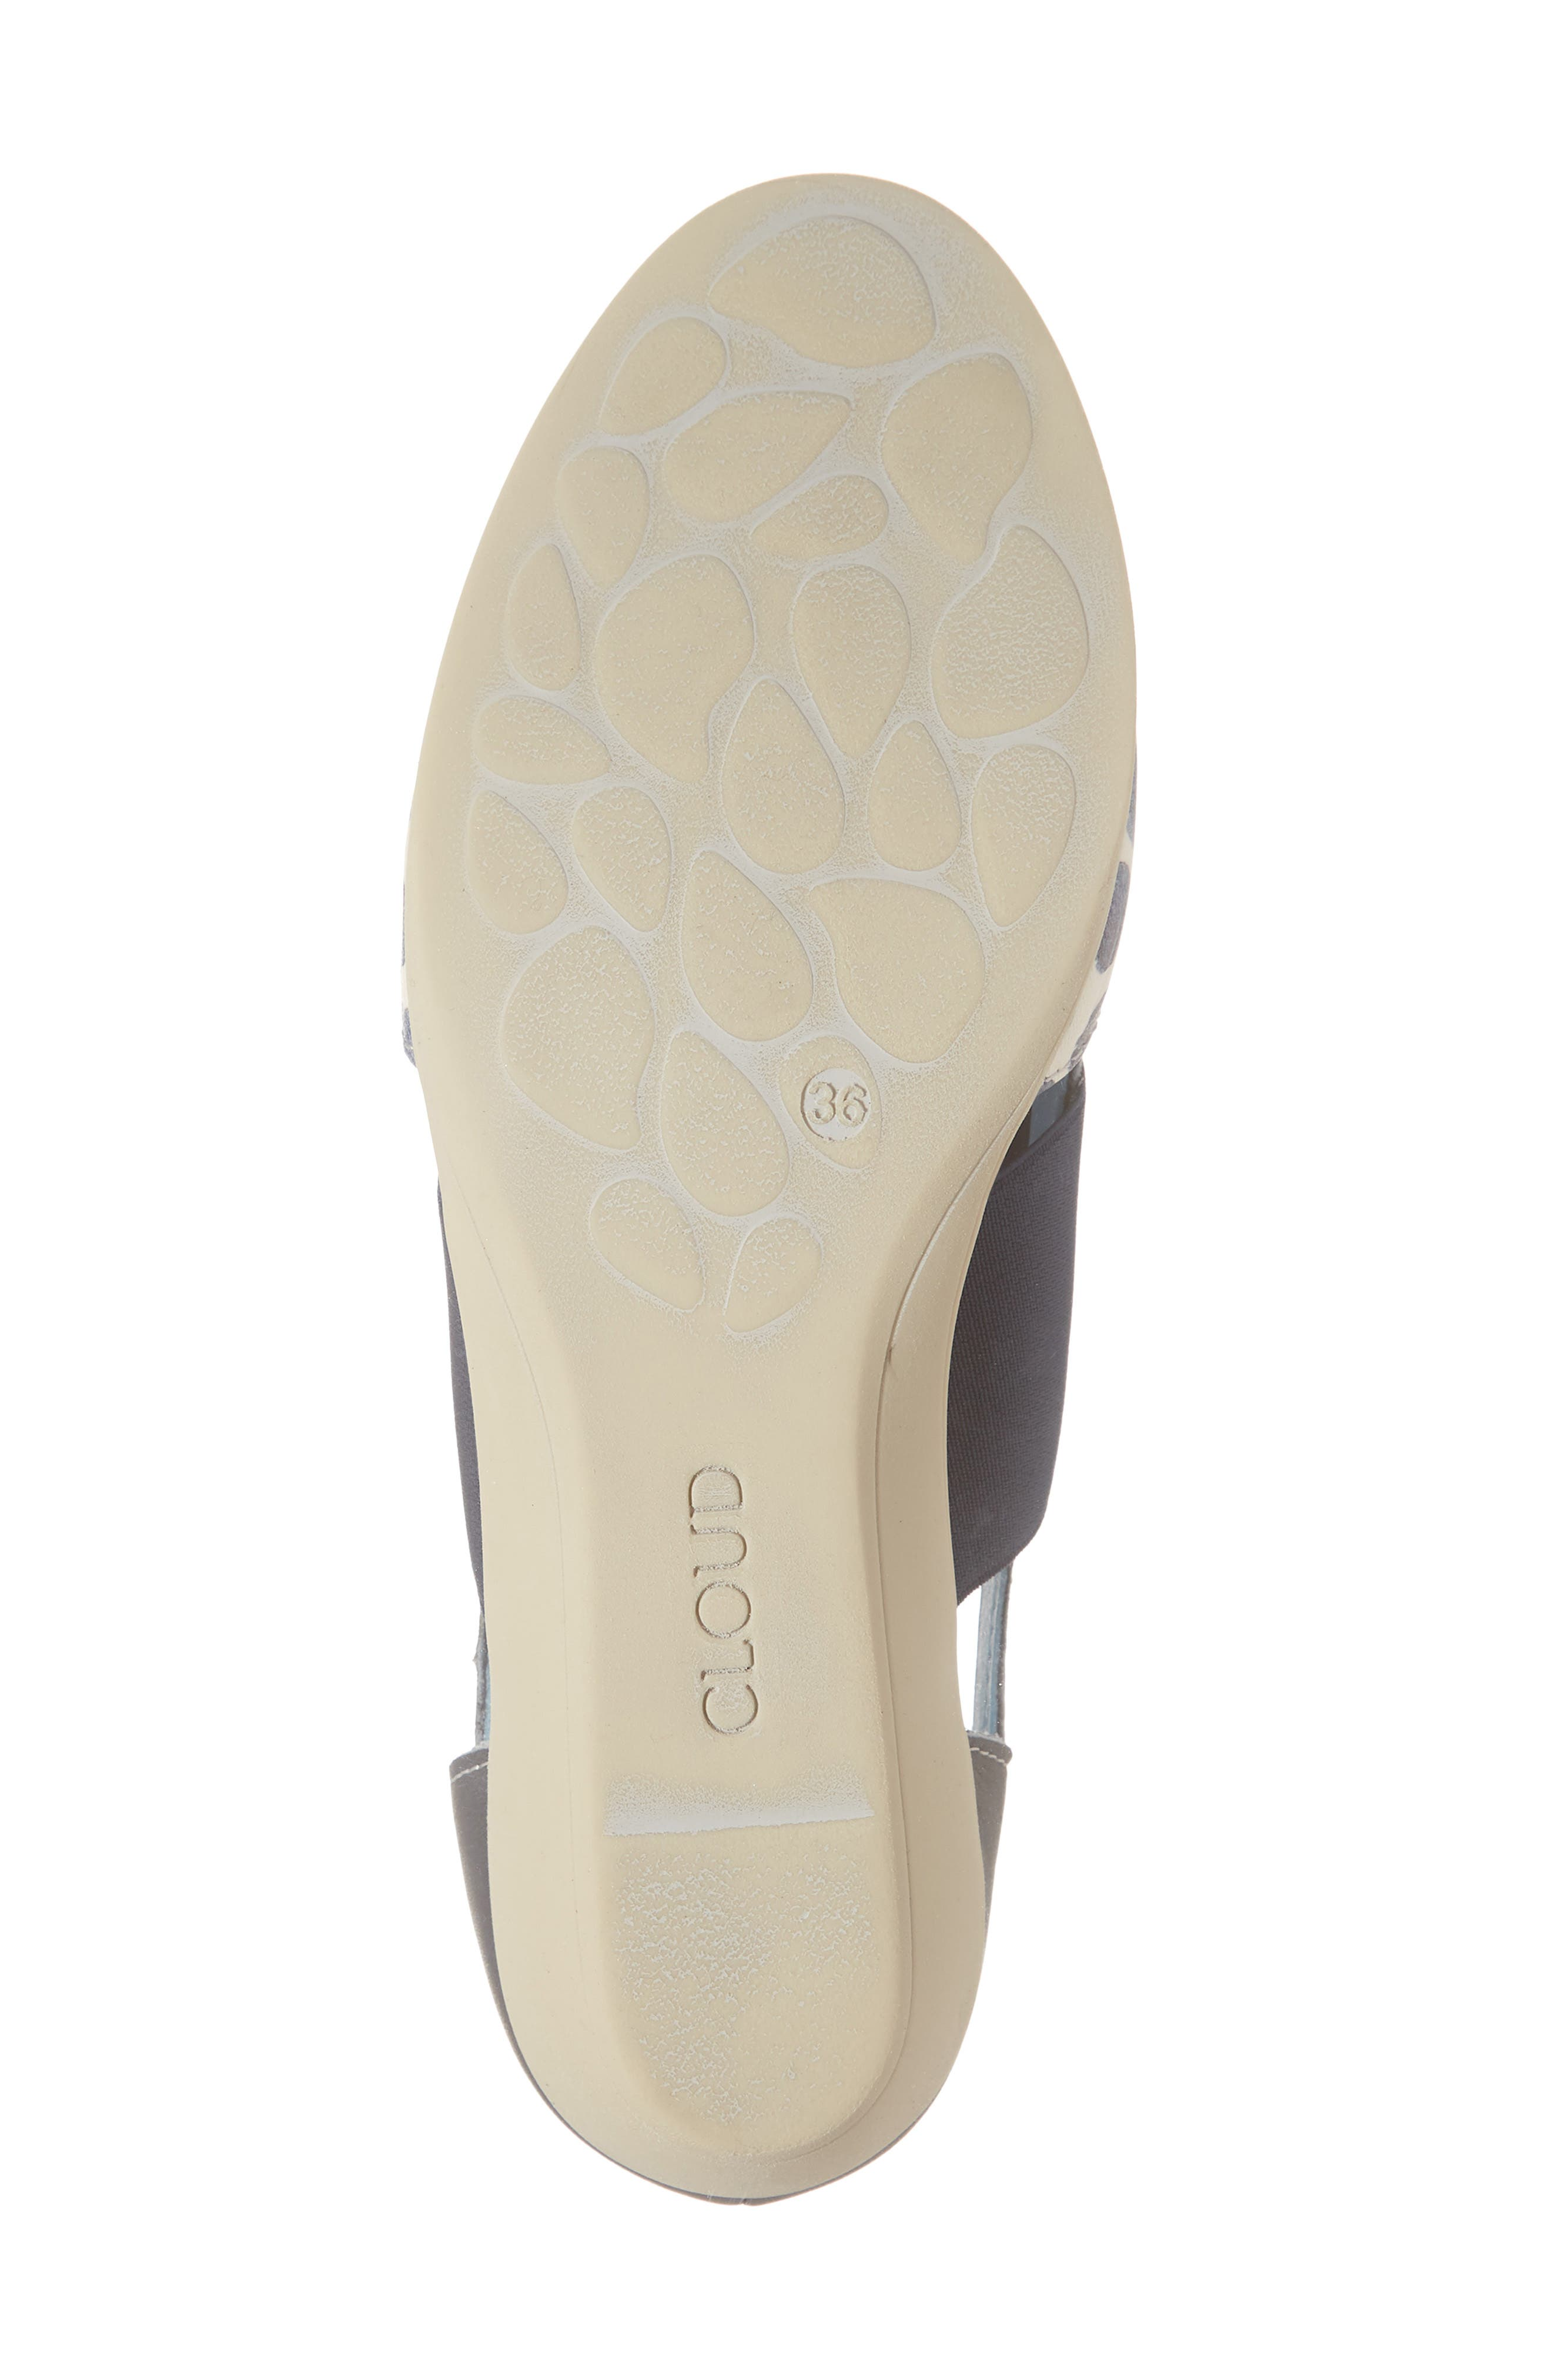 CLOUD,                             'Canary' Skimmer Sandal,                             Alternate thumbnail 6, color,                             TUPAI BLUE LEATHER